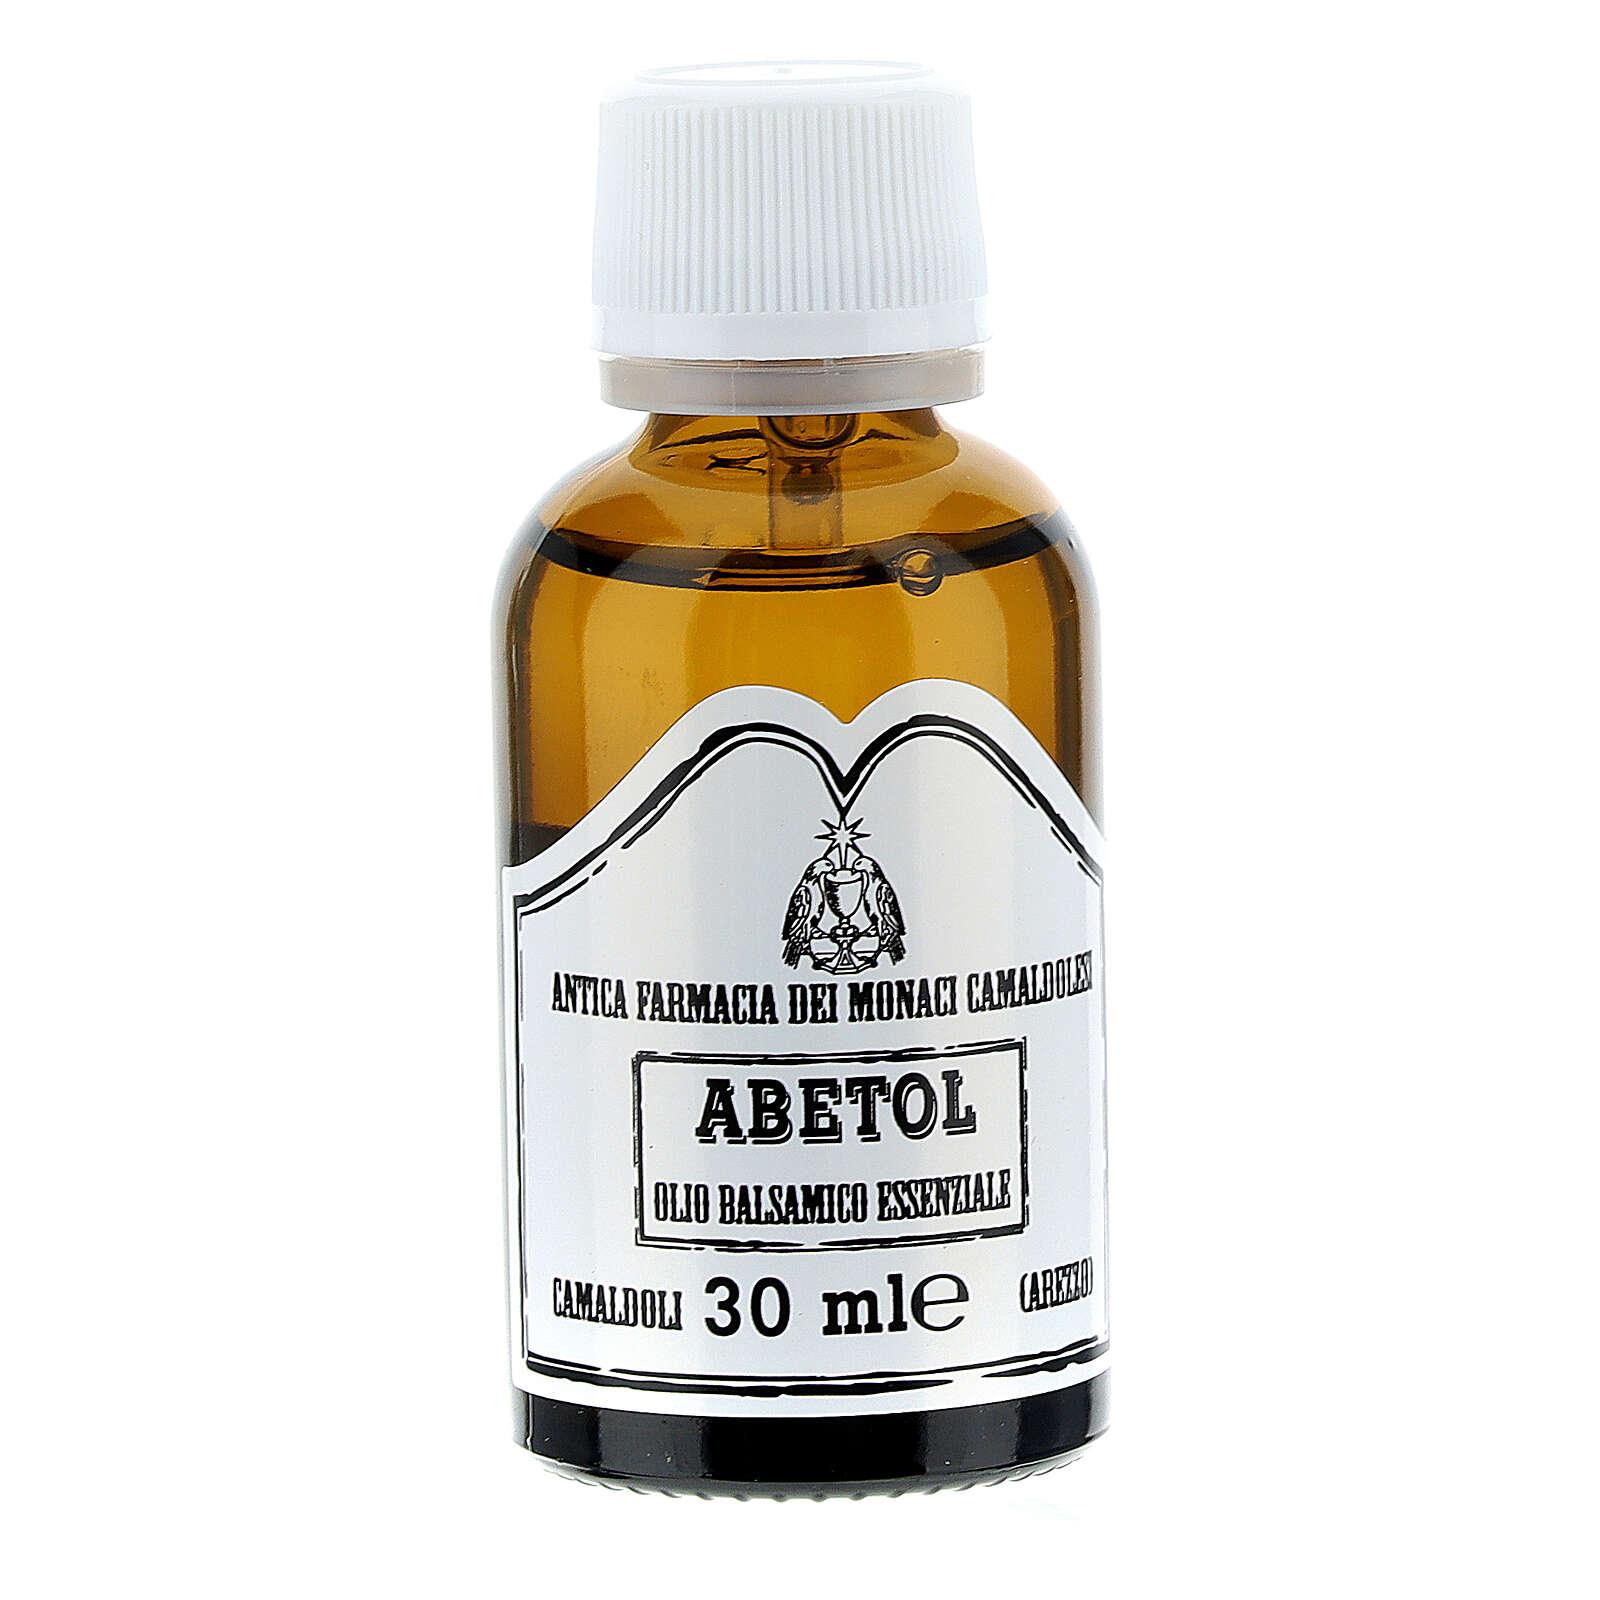 Abetol (30 ml) 4